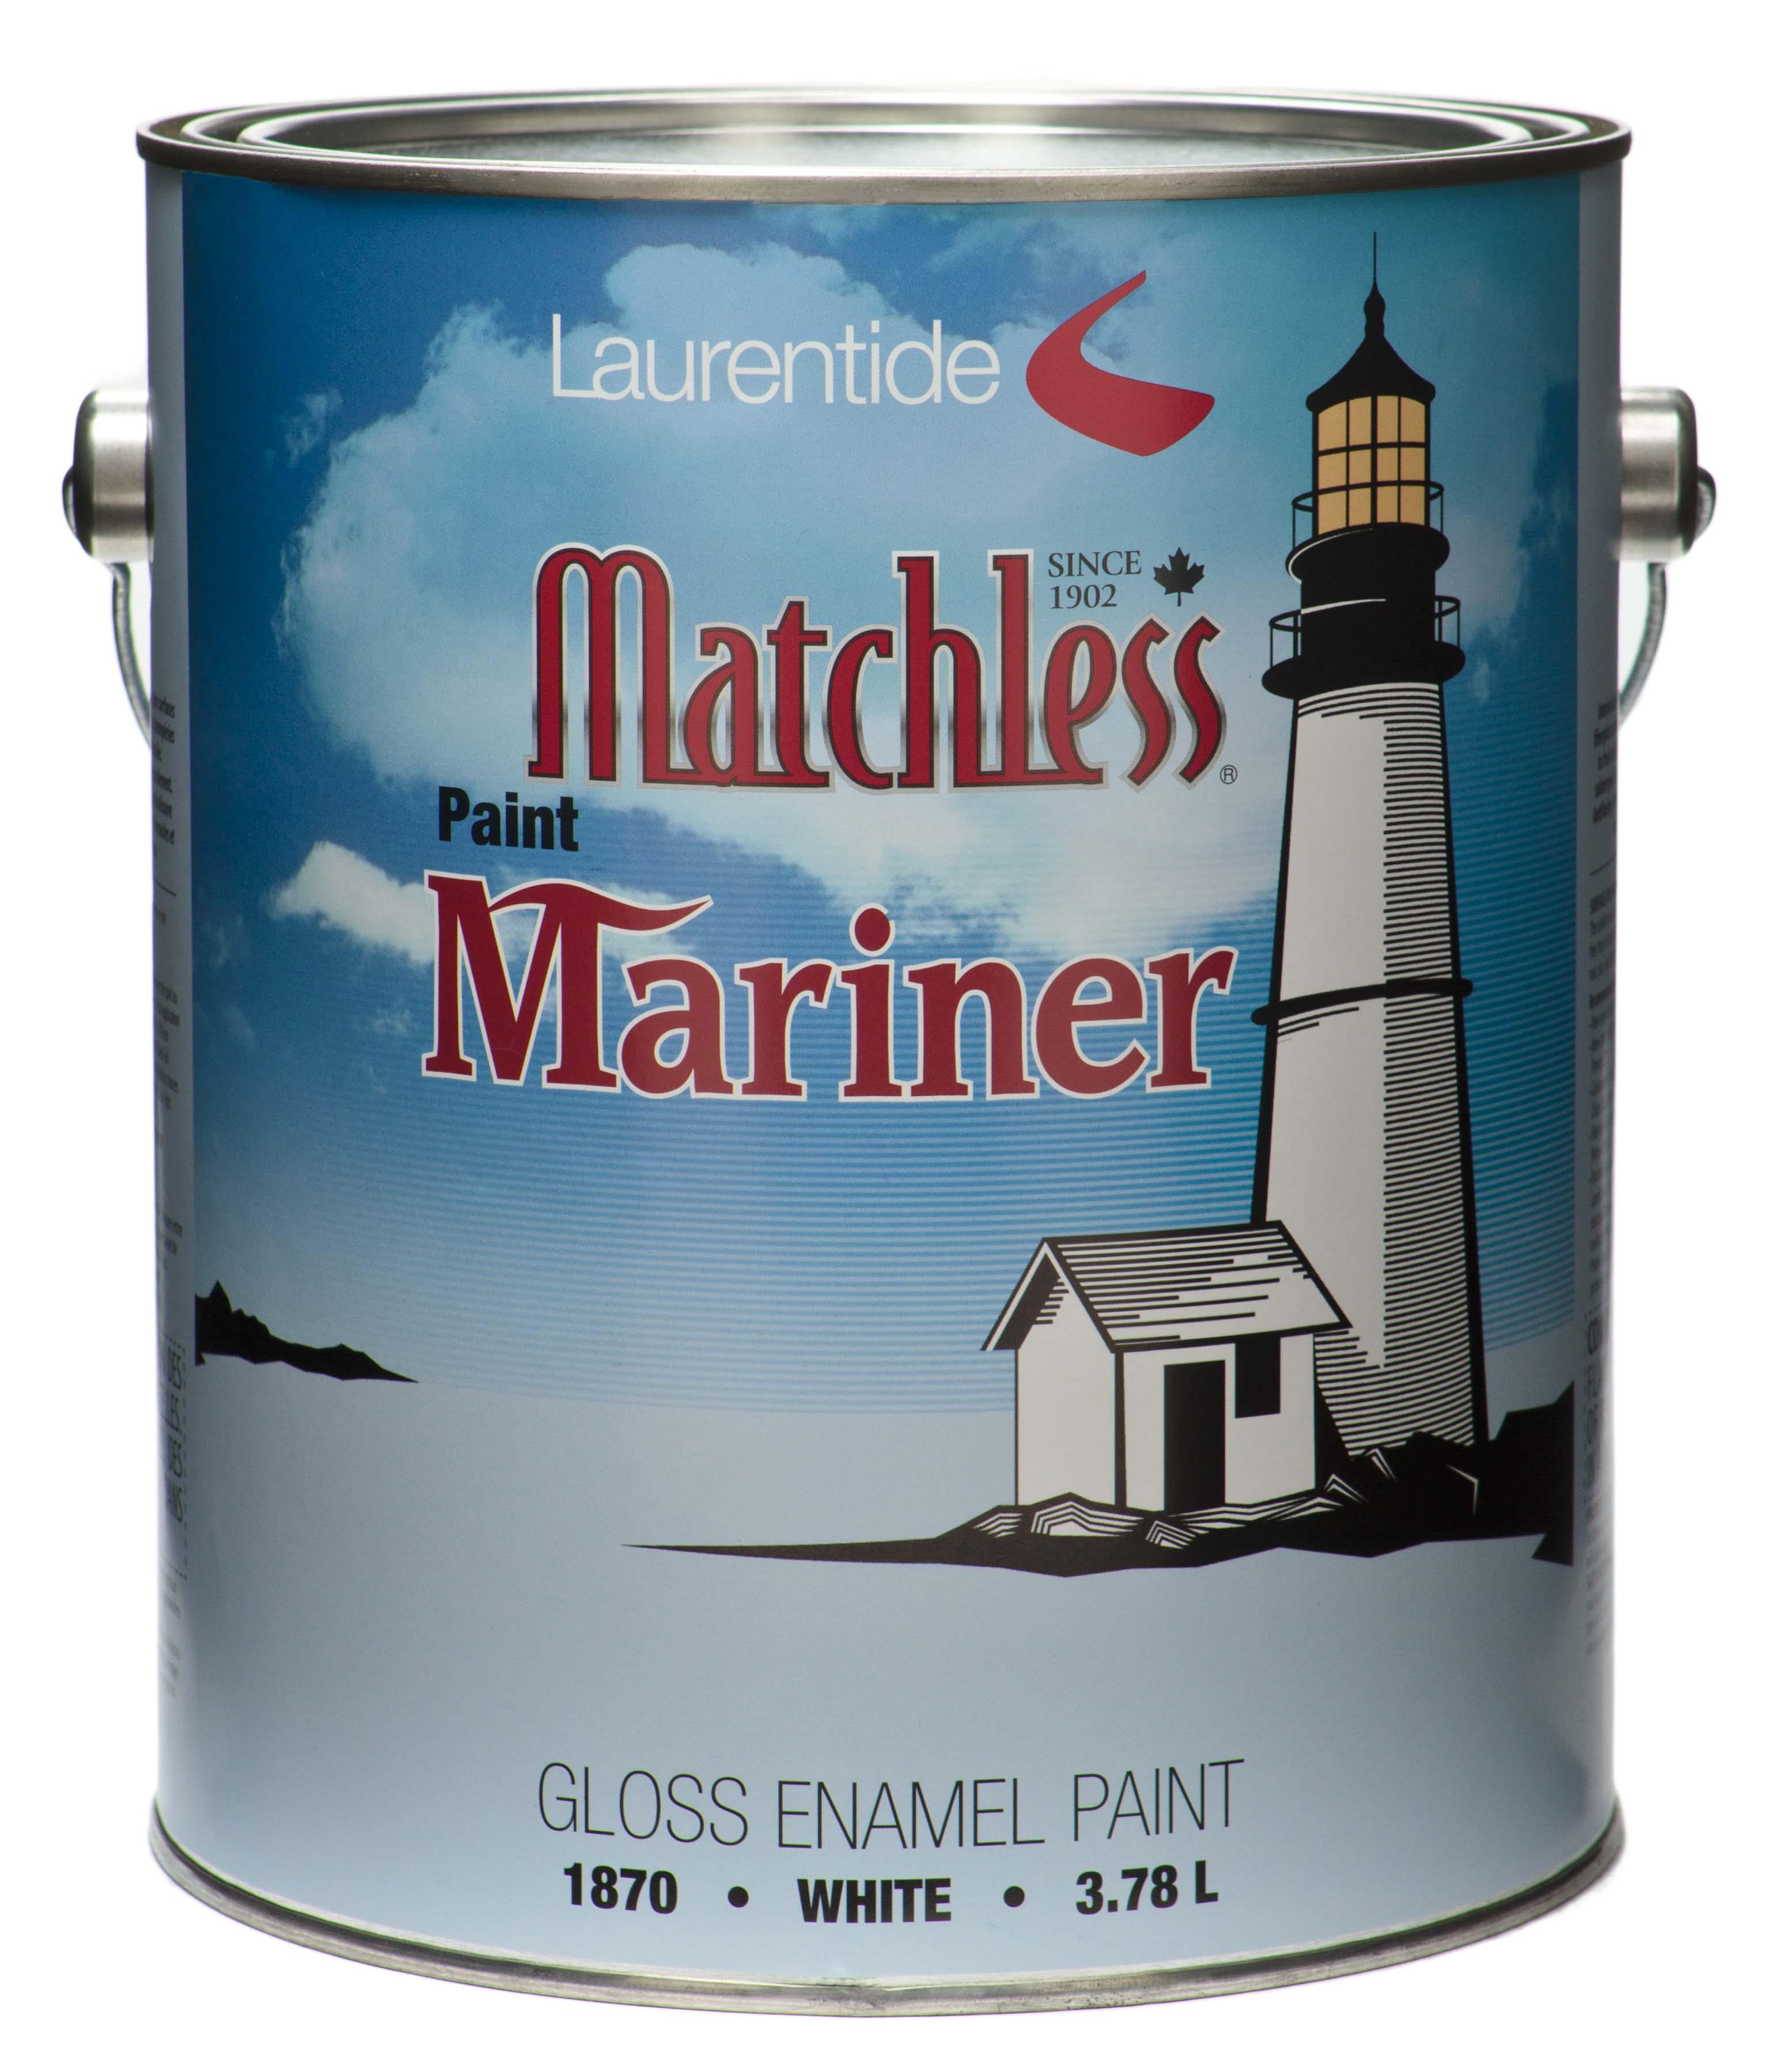 Matchless Mariner Marine Paint